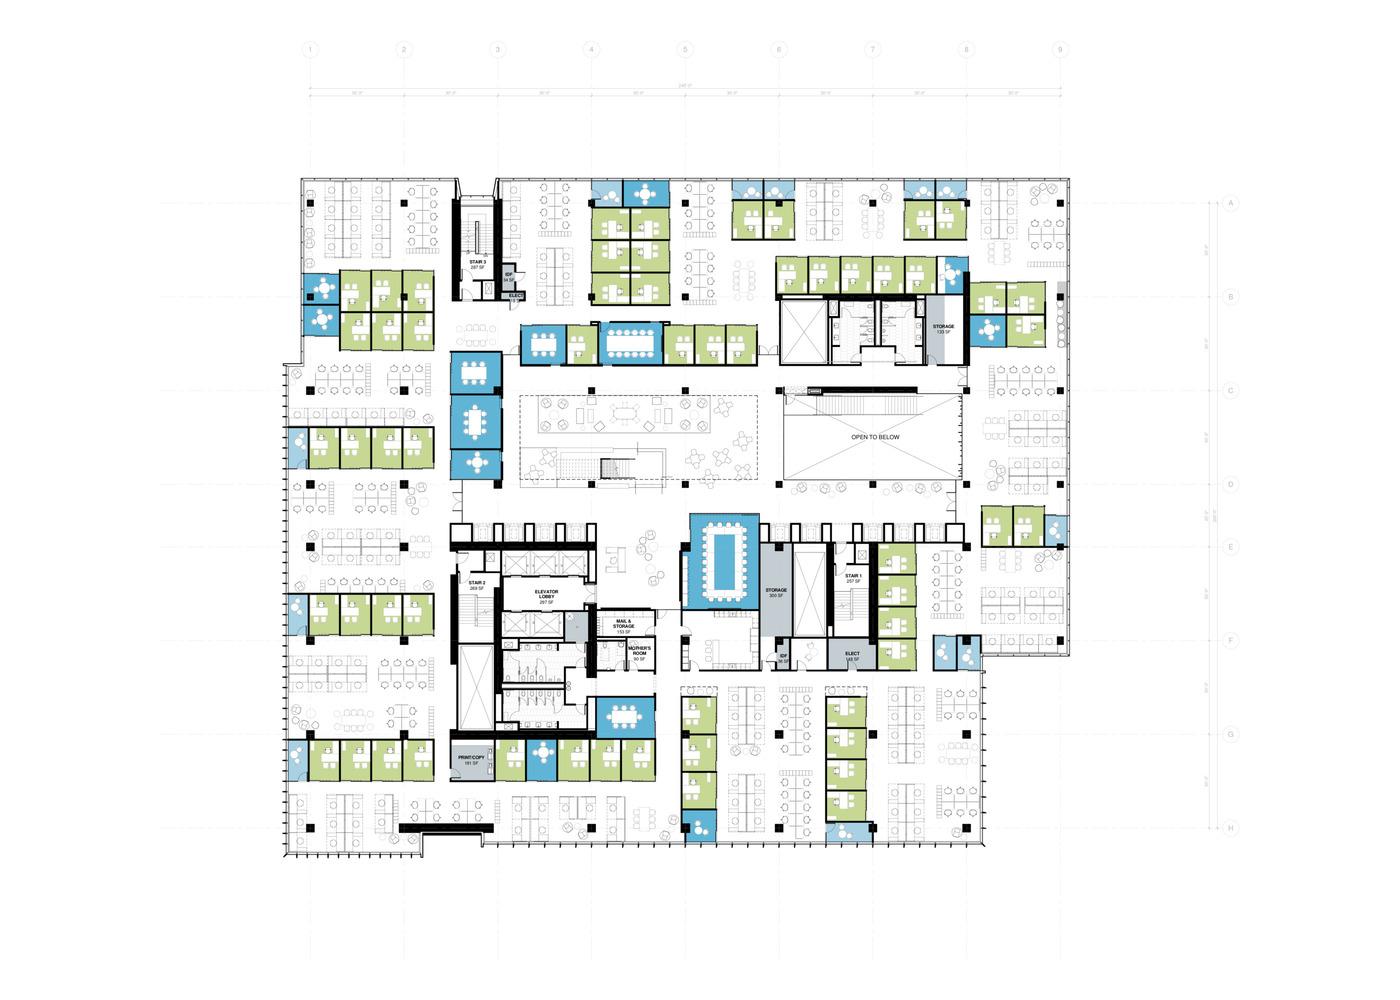 Academic Office Building / WRNS Studio